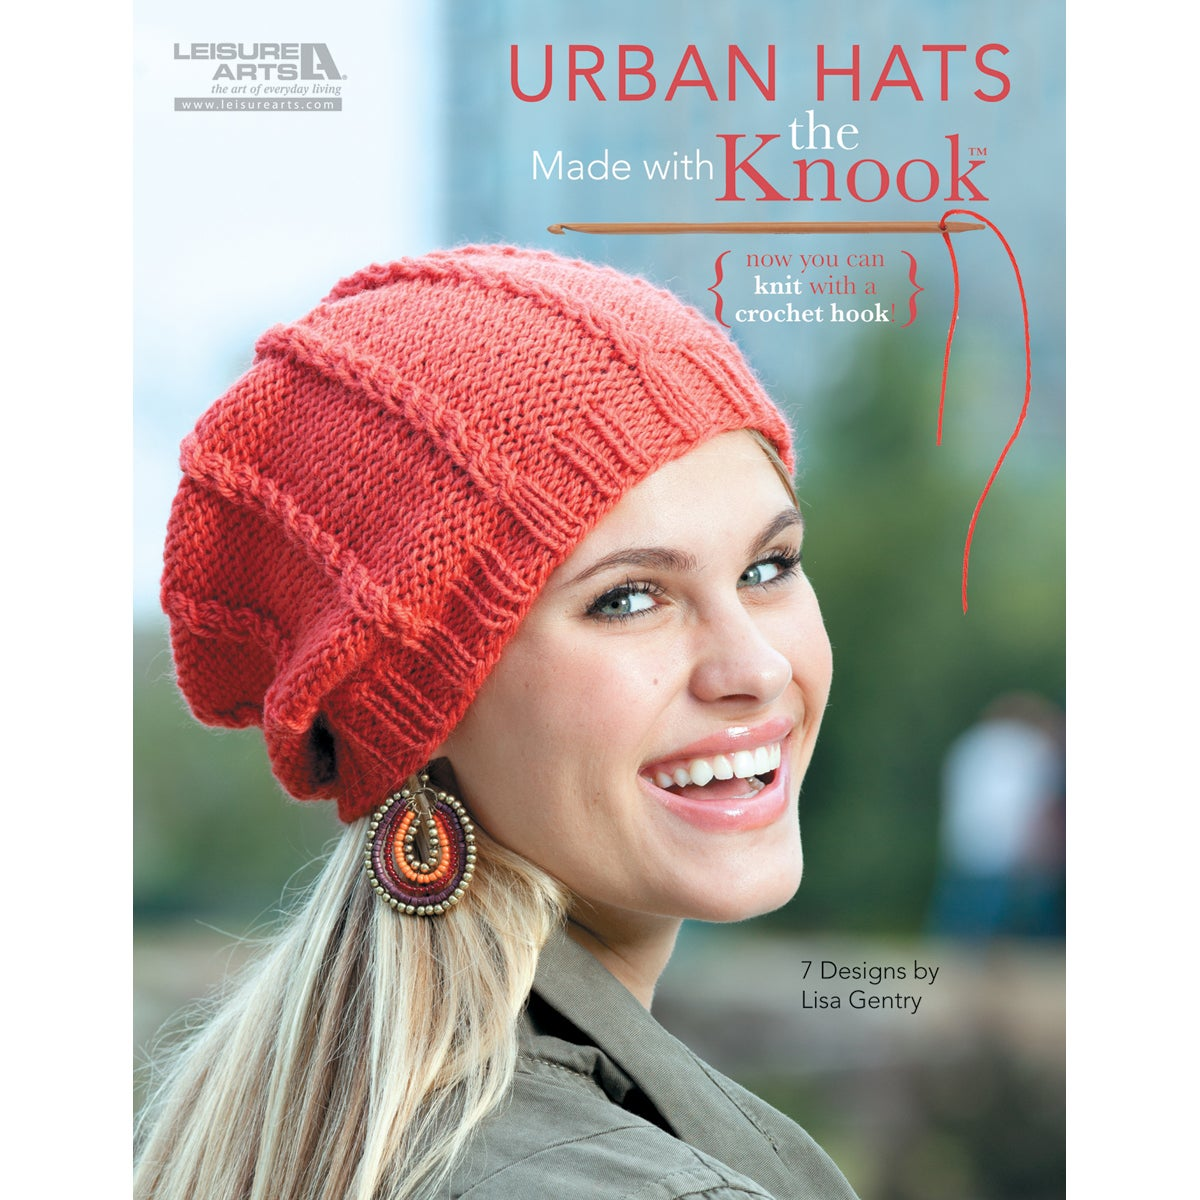 Leisure Arts-Urban Hats